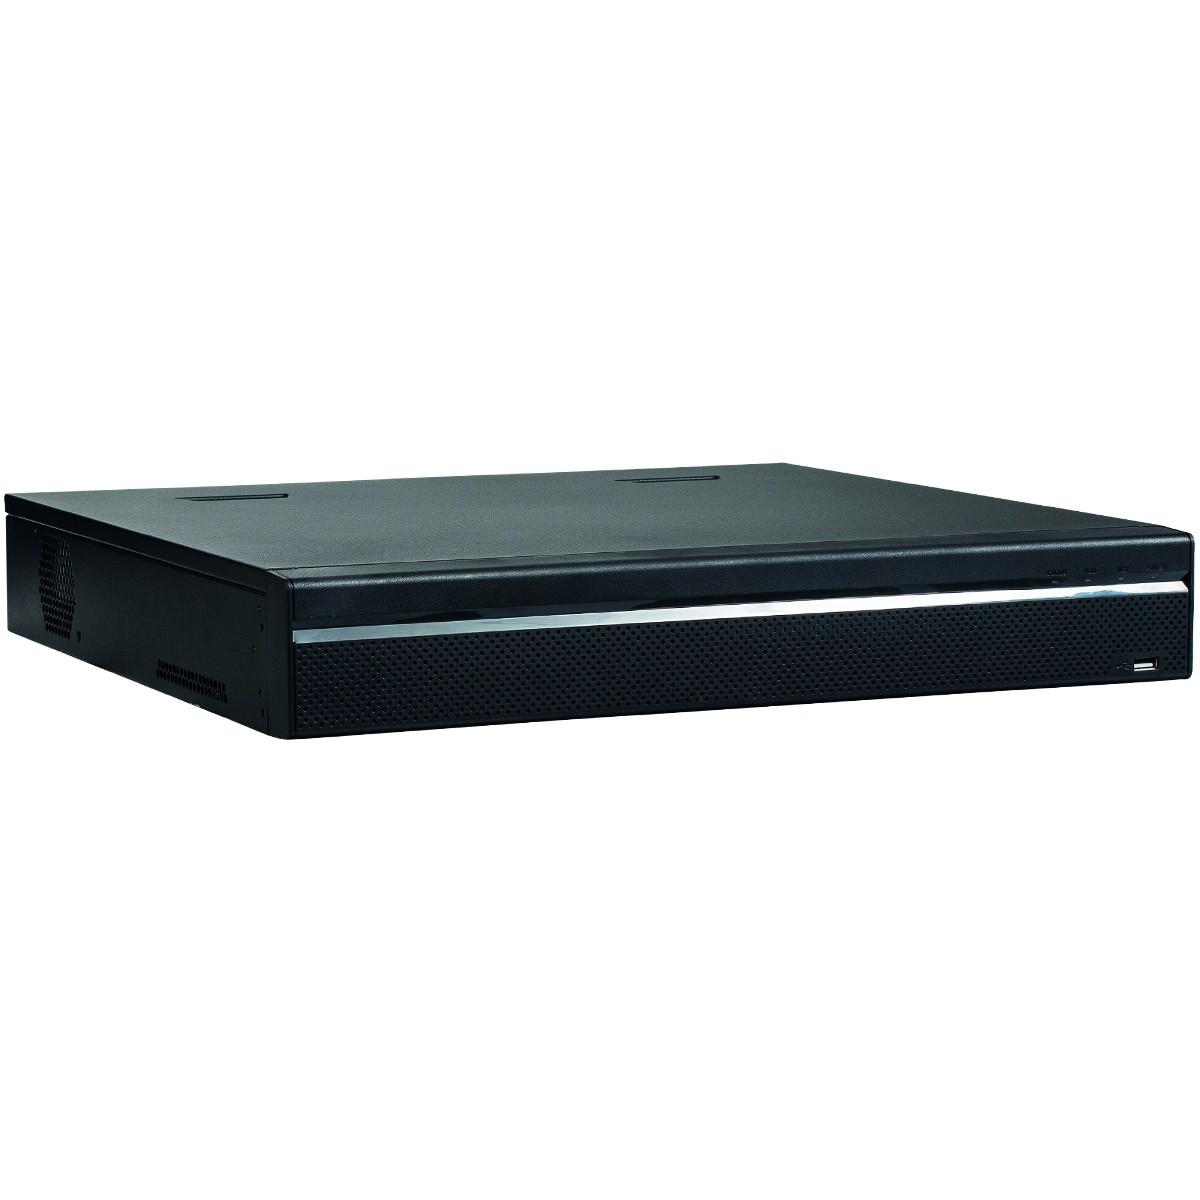 TURM Ultra 16 Kanal DVR Rekorder für Full HD Echtzeit Aufnahme